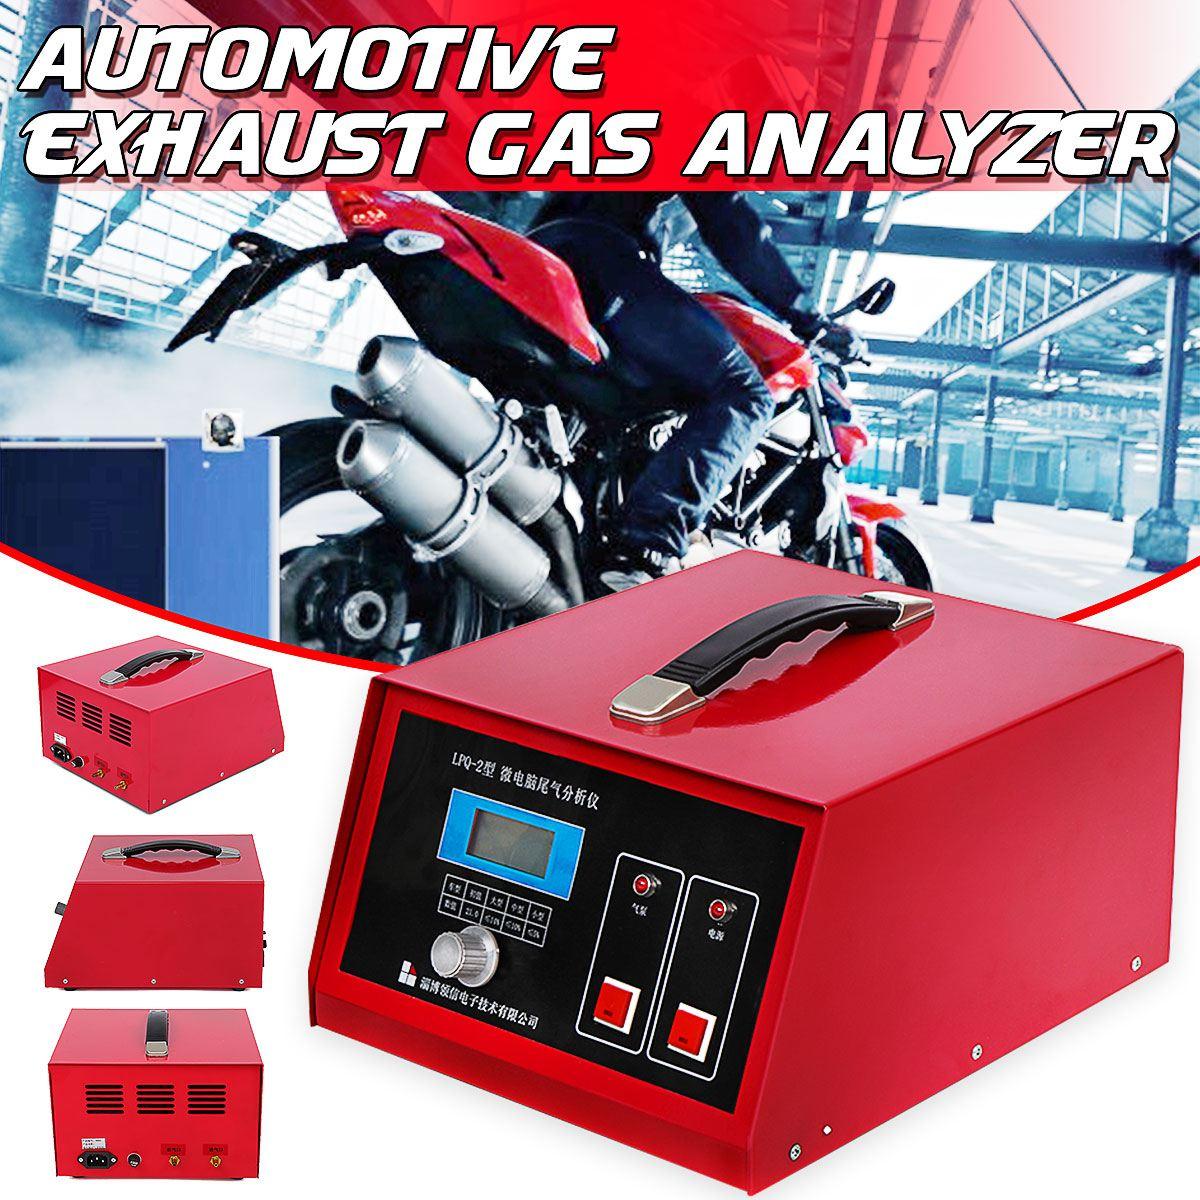 Vehicle 220V Automotive Exhaust Gas Analyzer Vehicle Emission Gas Analyzer Tail Gas  Detect Oxygen Content Air Quality Monit